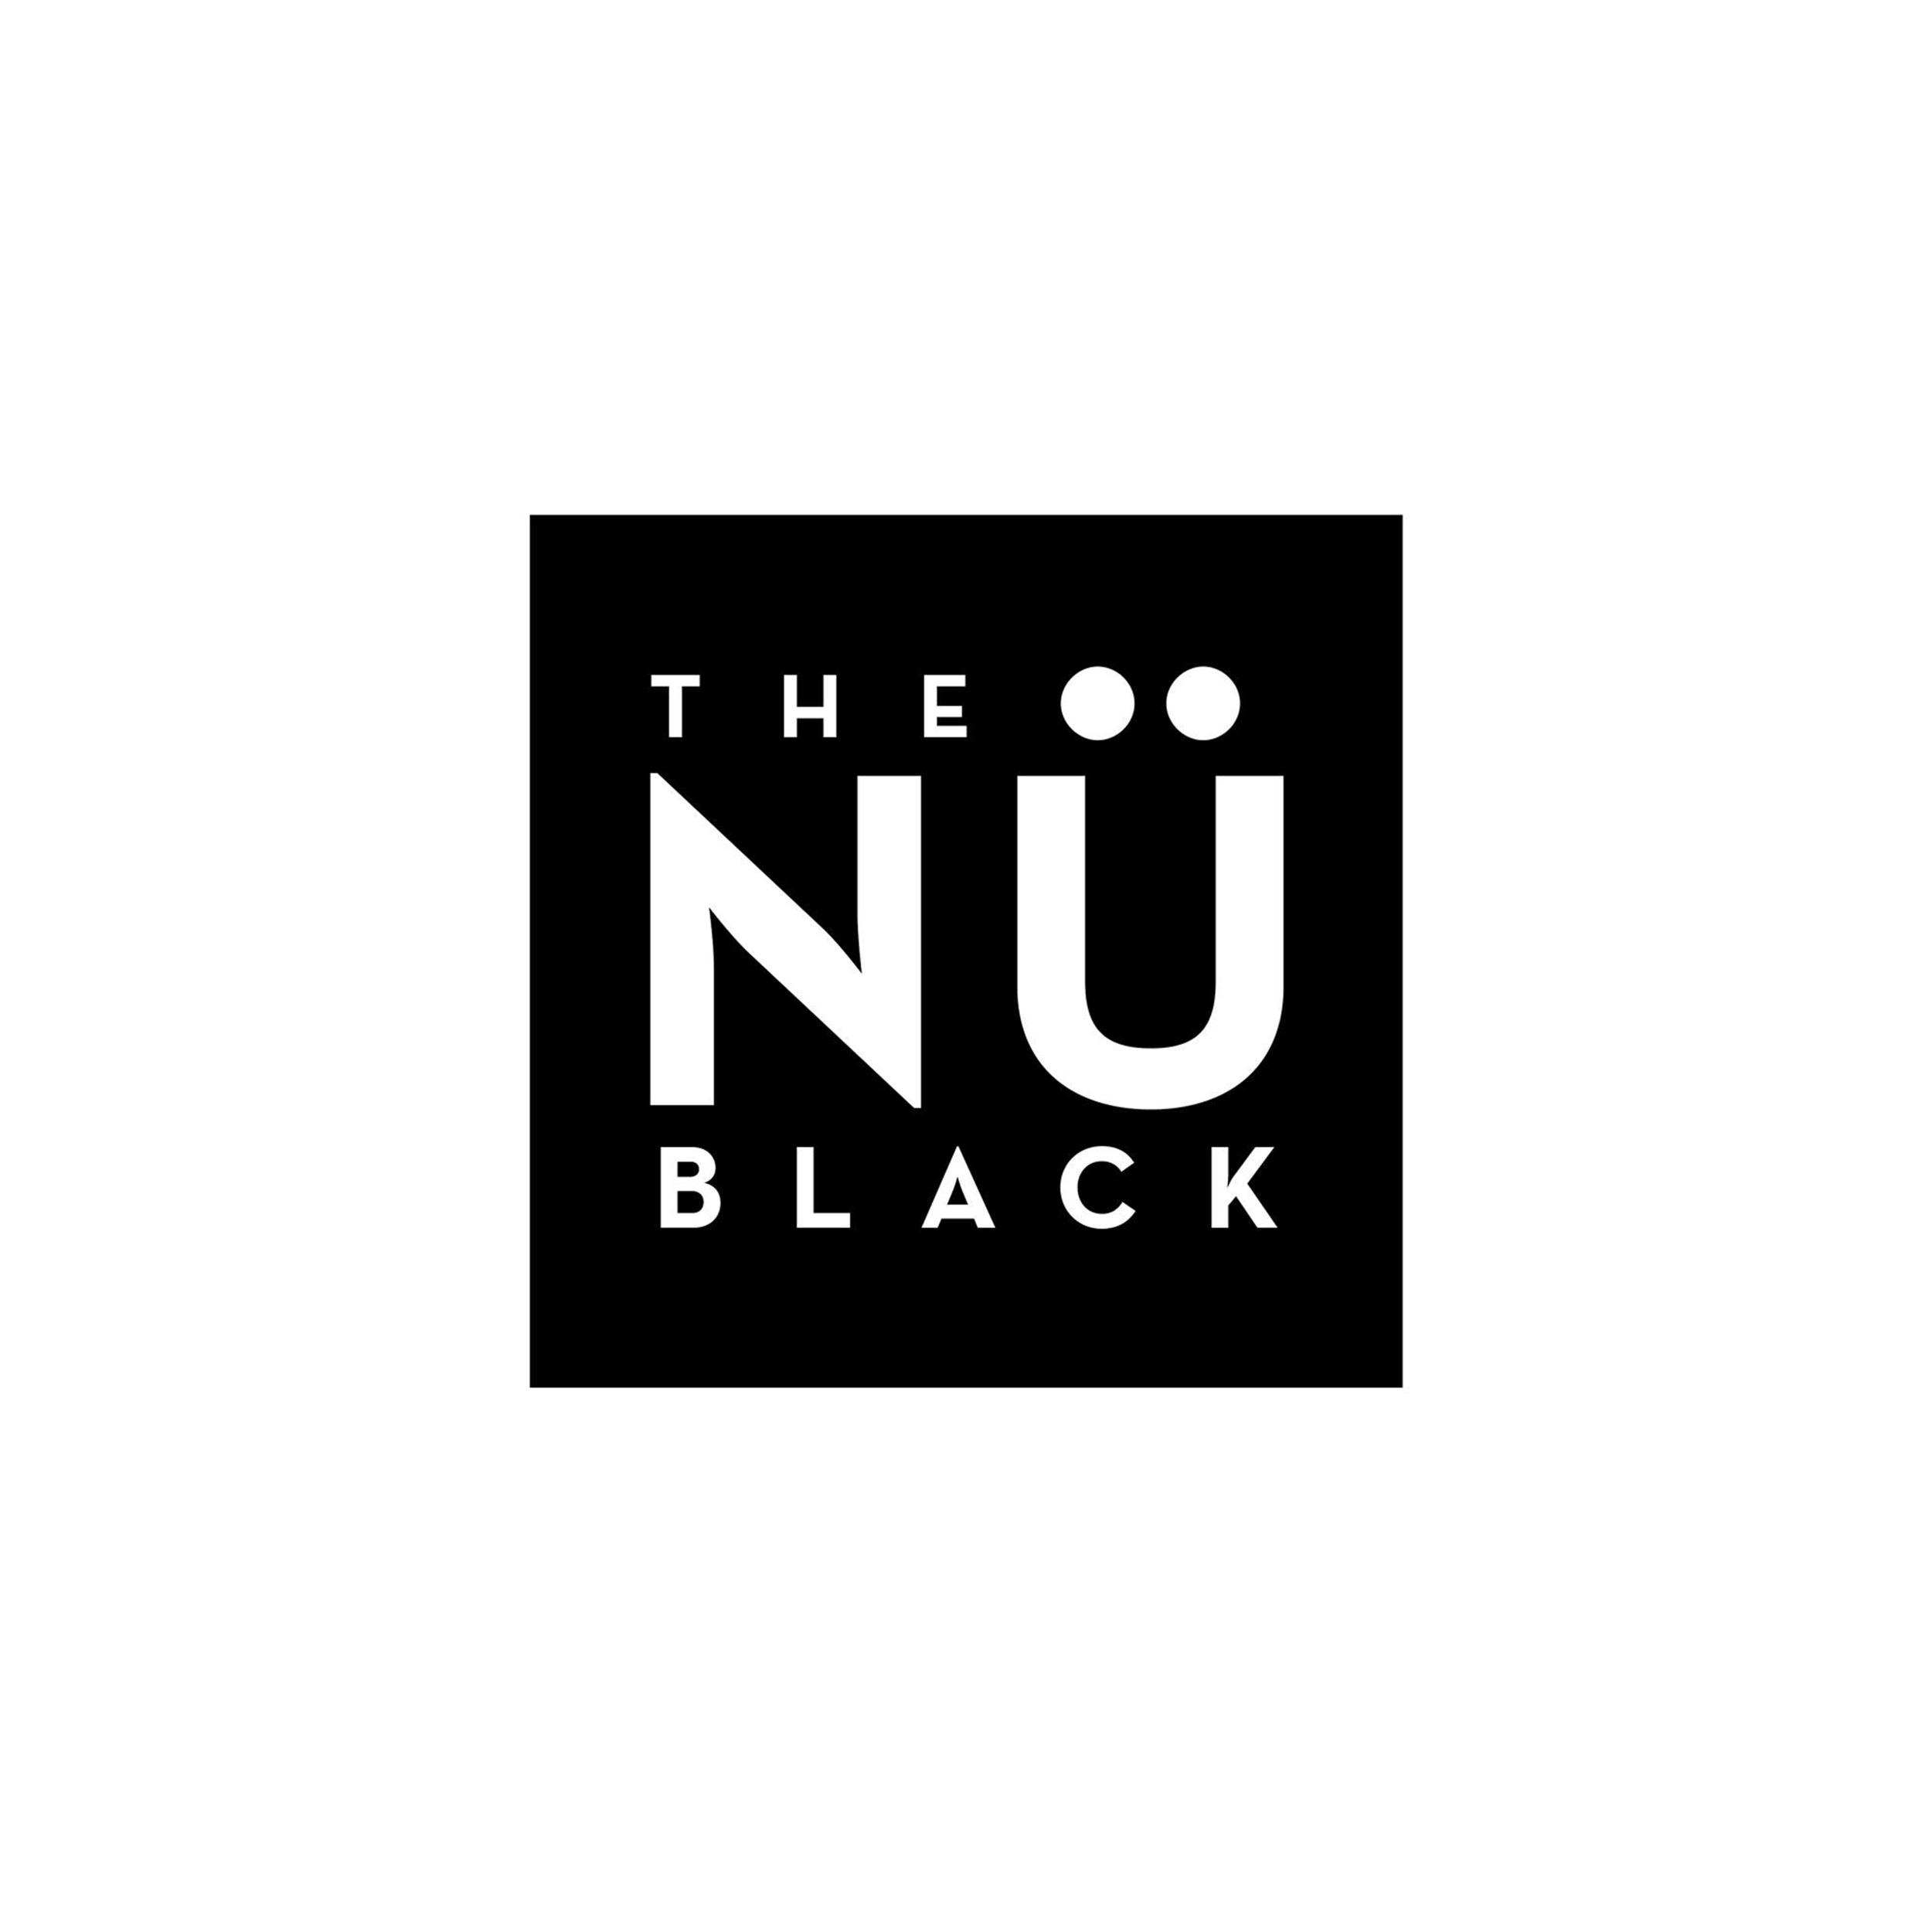 THE NU BLACK   A Dallas-based pop culture blog.